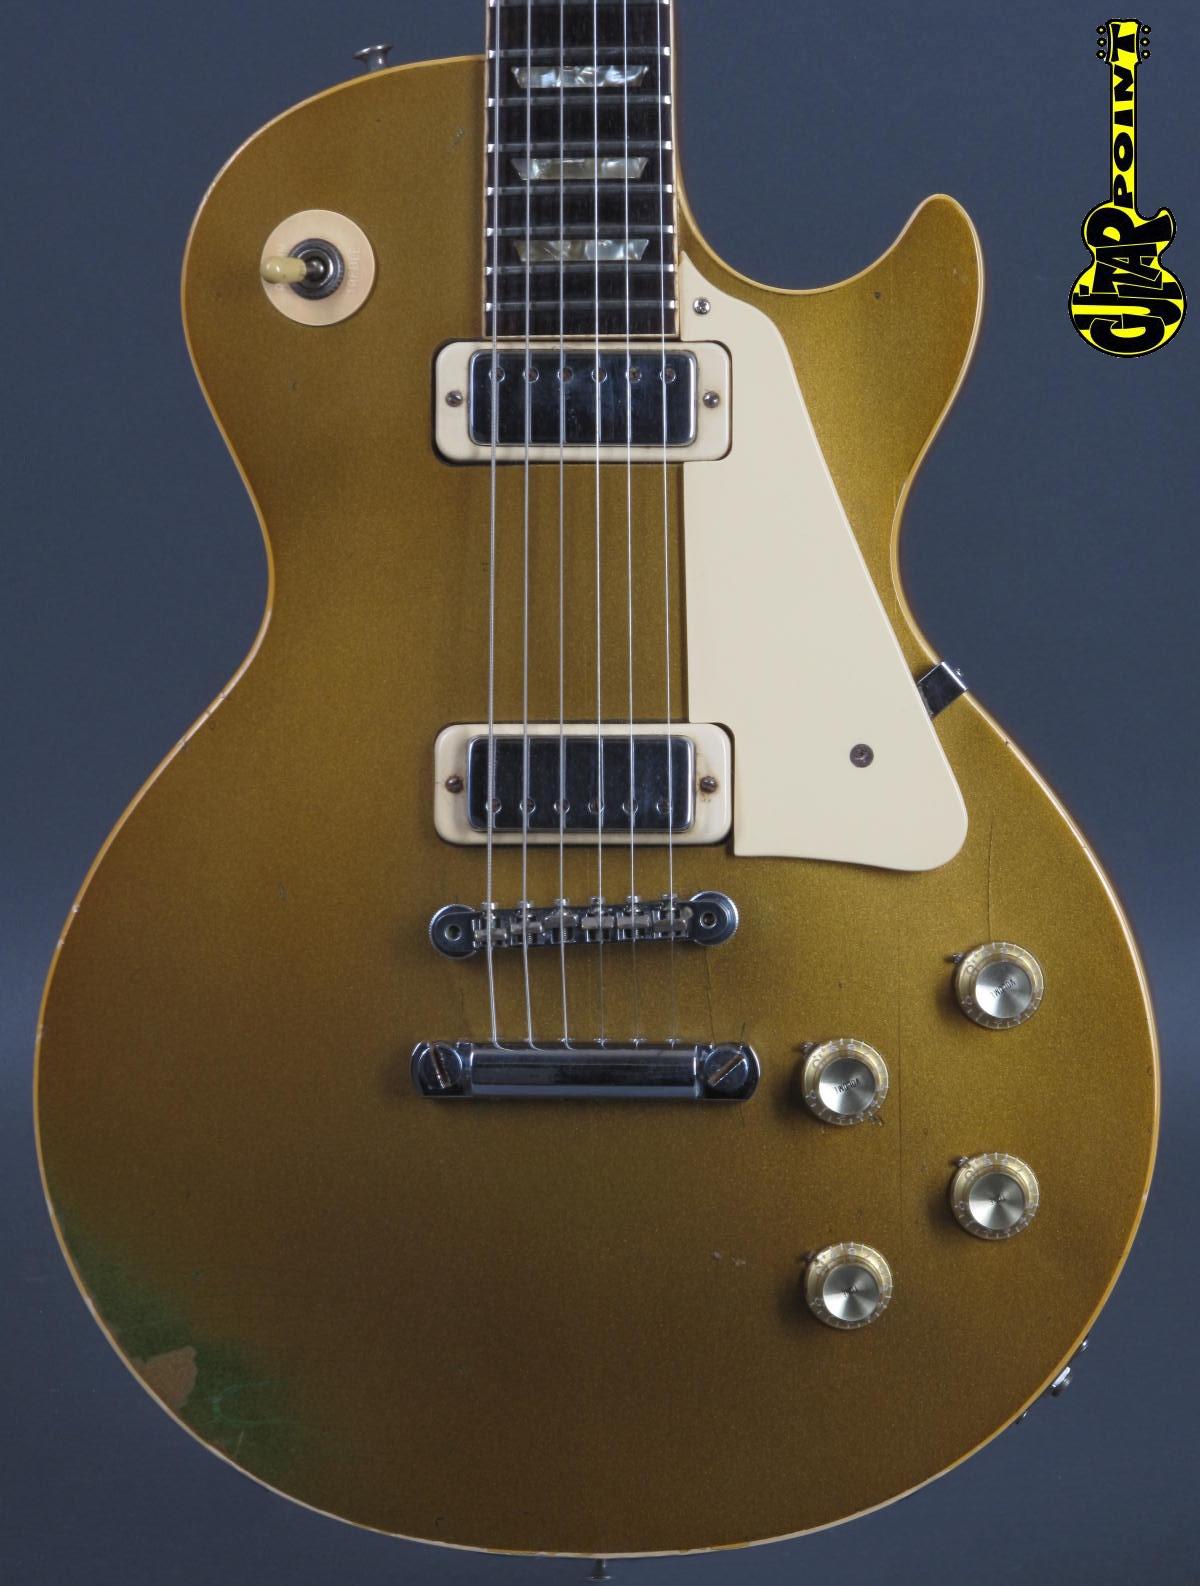 1973 Gibson Les Paul Deluxe - Goldtop